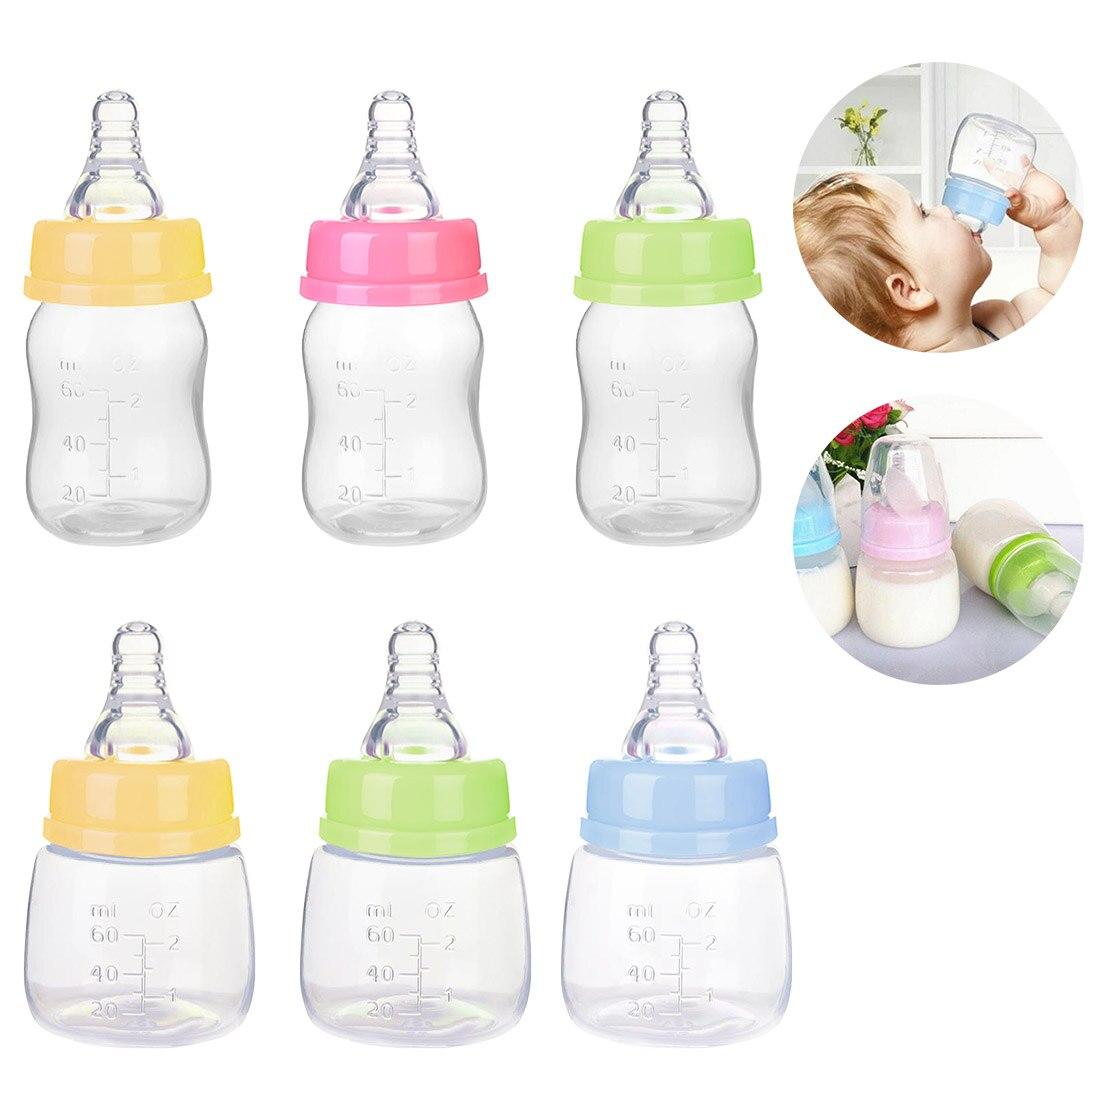 Baby 60ml Standard Caliber Milk Feeder Juice Feeder Mini Bottle Newborn Kids Nursing Care Feeder Fruit Juice Milk Water Bottle